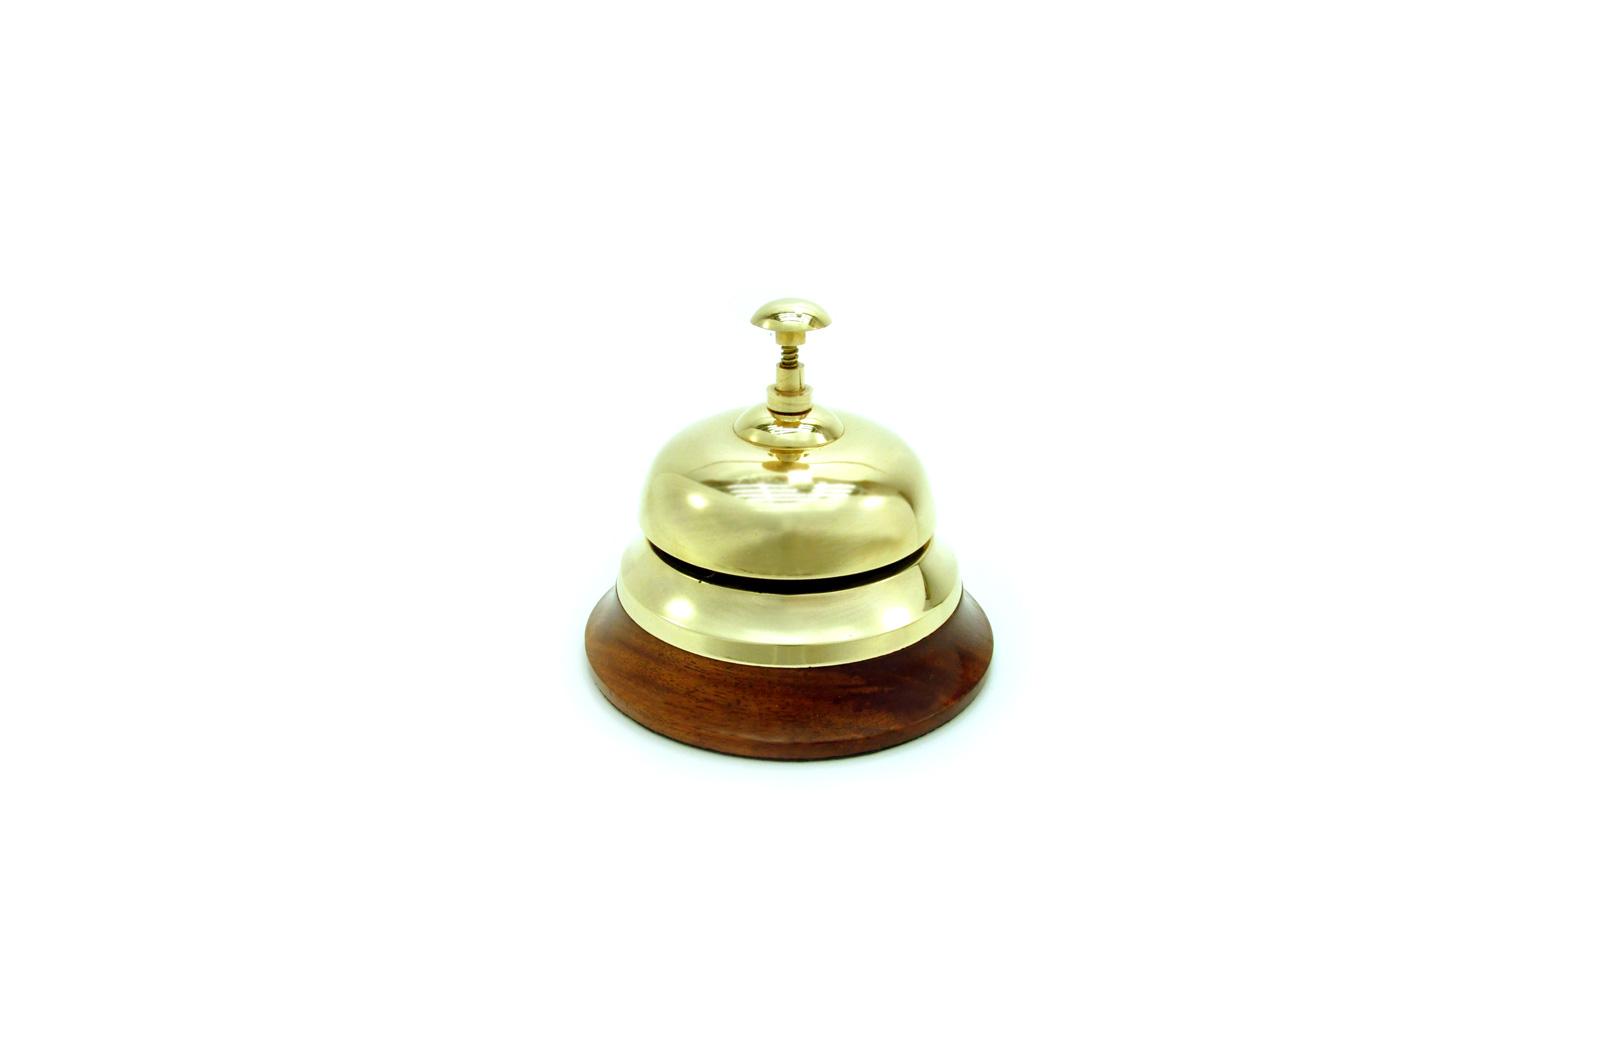 Klassische Vintage Hotelglocke Rezeptionsglocke Glocke  aus Messing